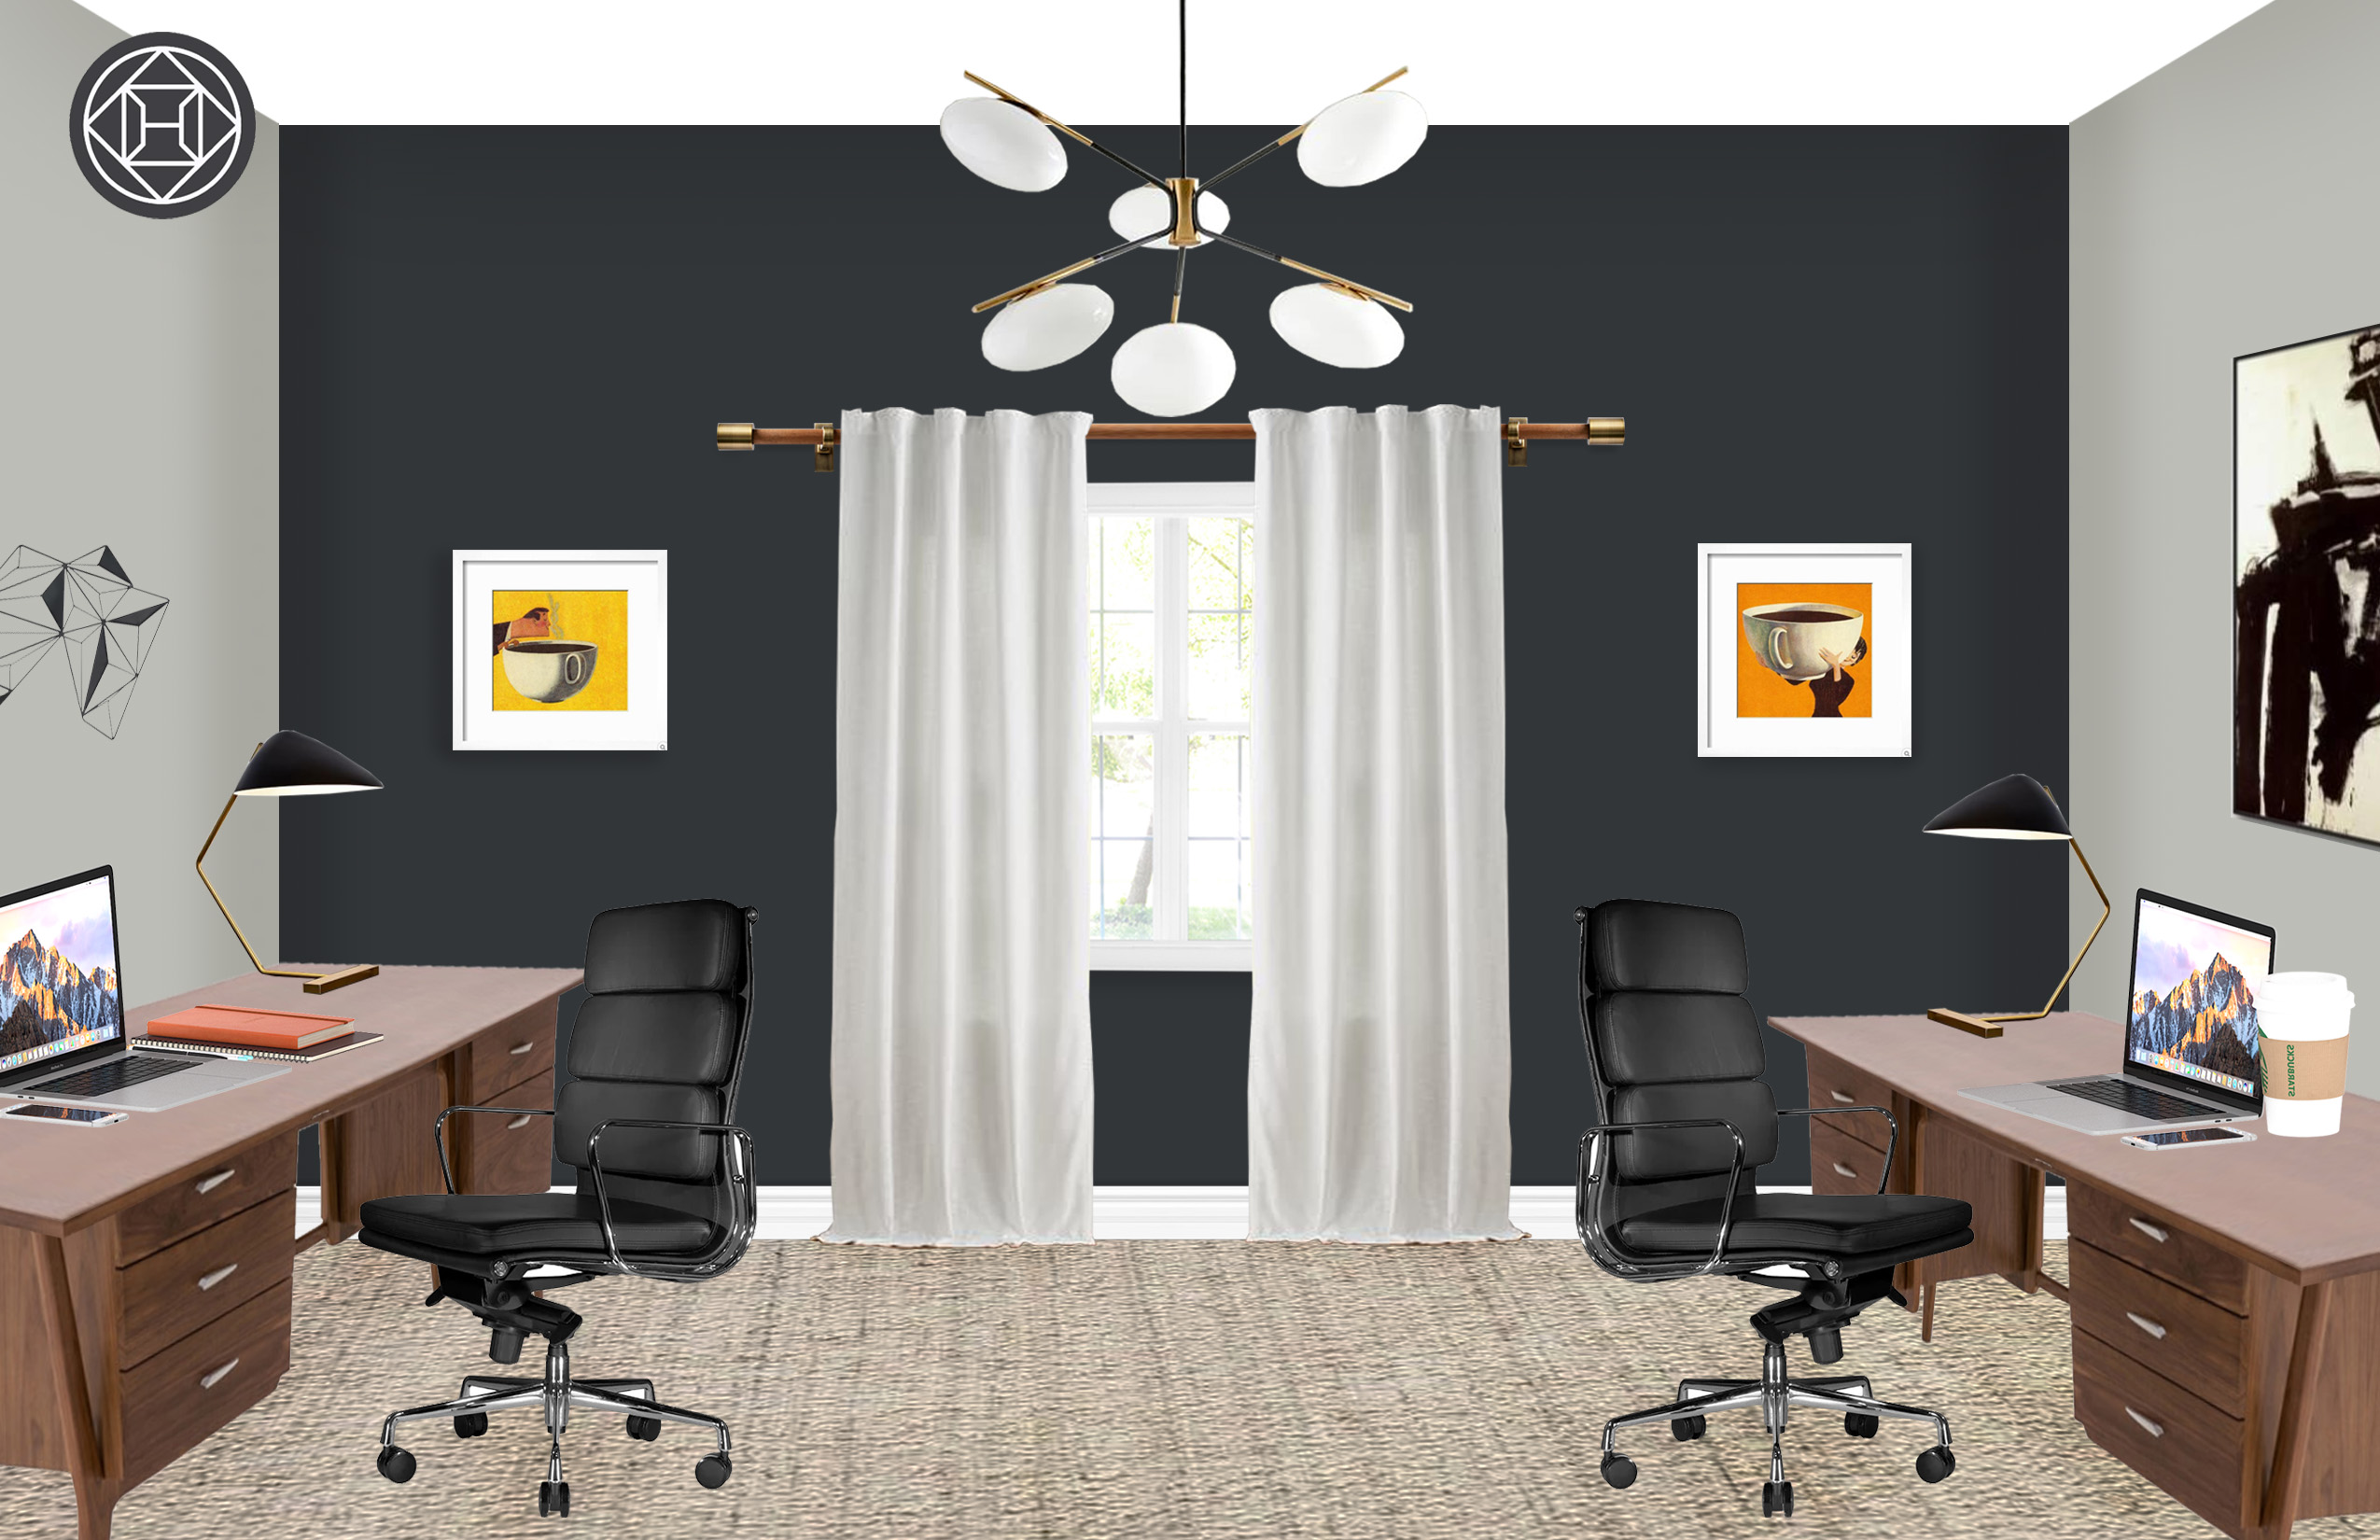 Midcentury Modern Office Design By Havenly Interior Designer By Cris